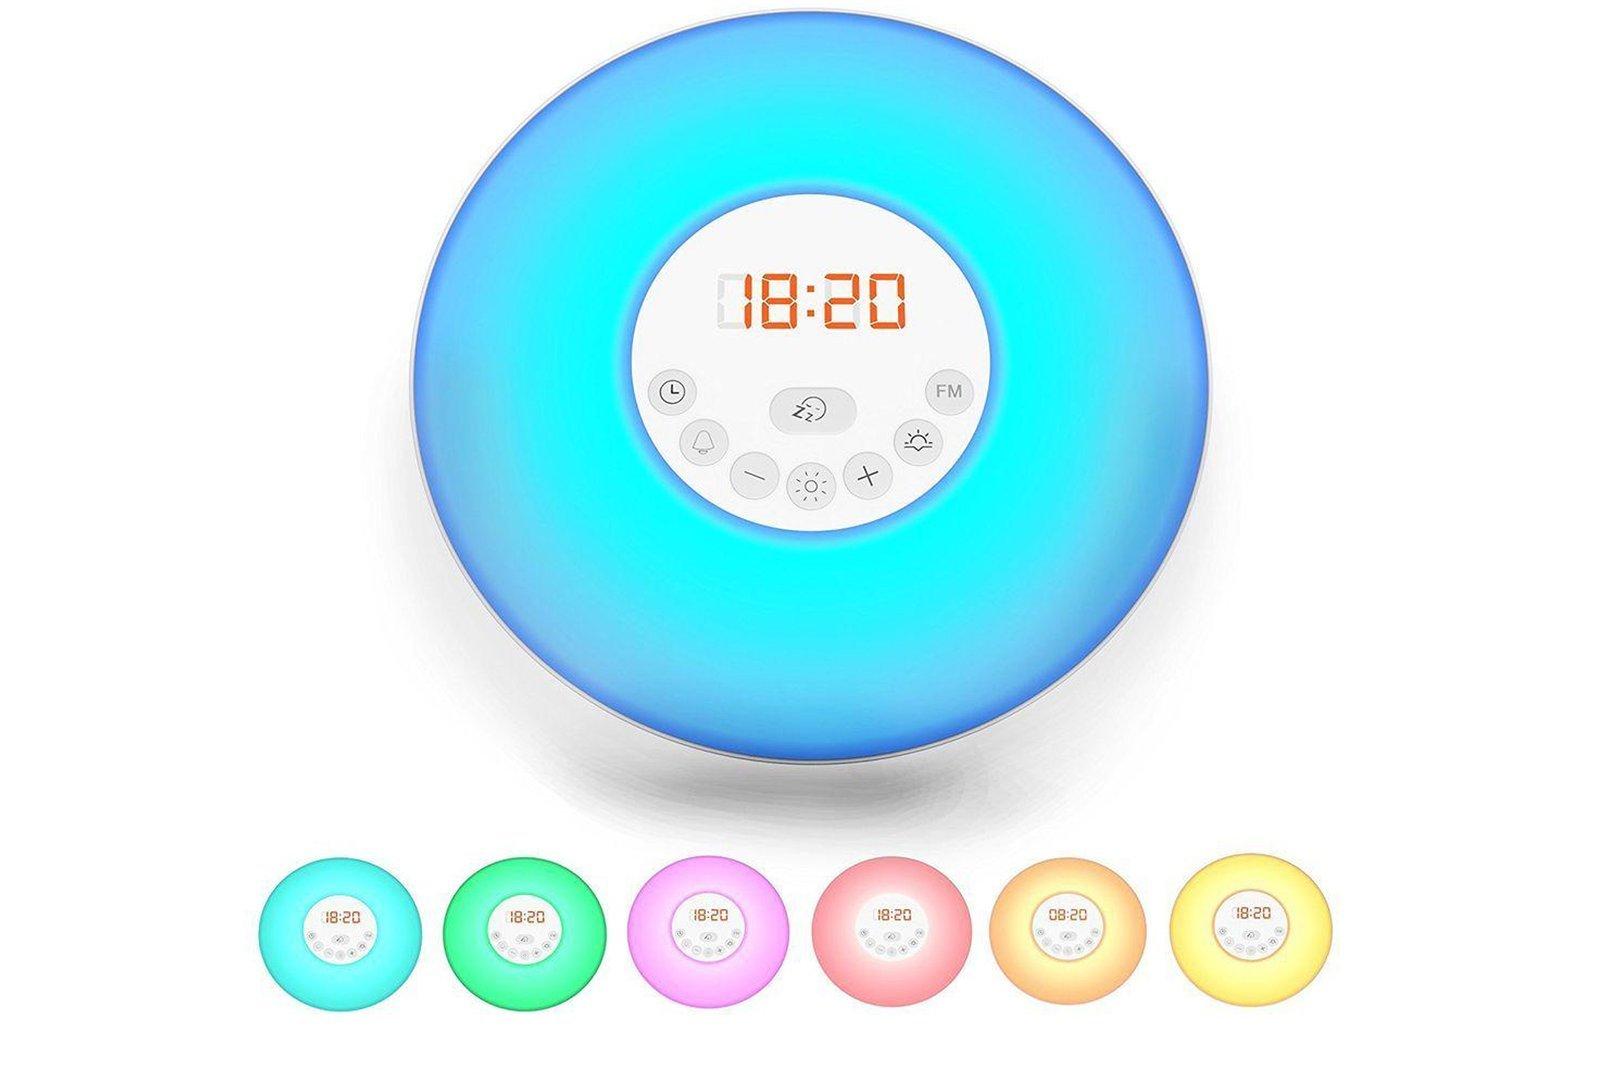 B.K.Licht Alarm Clock With FM Radio Sunrise Wake Up Light Simulation